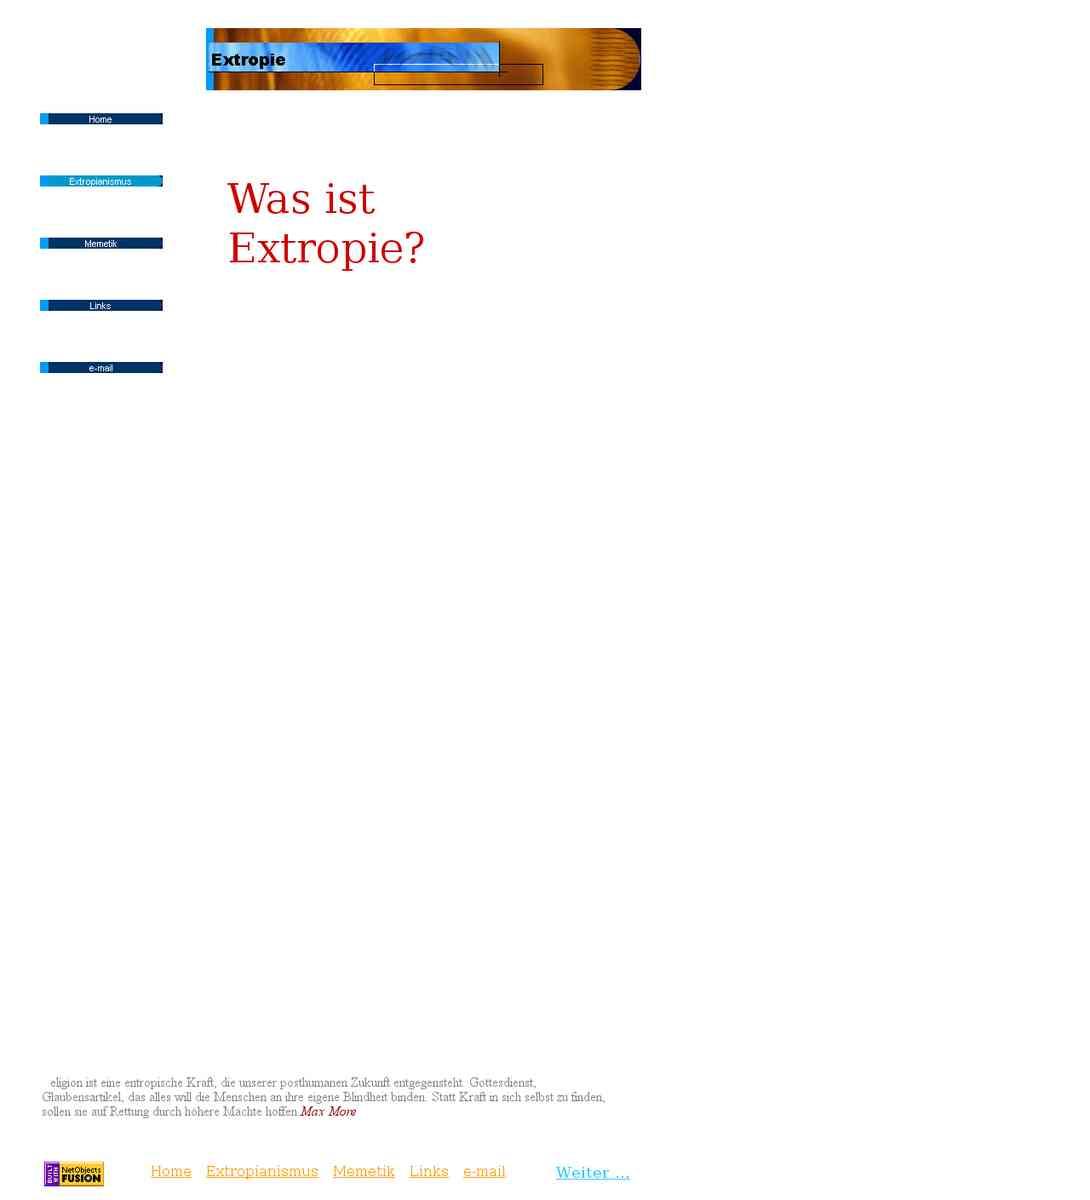 Extropie